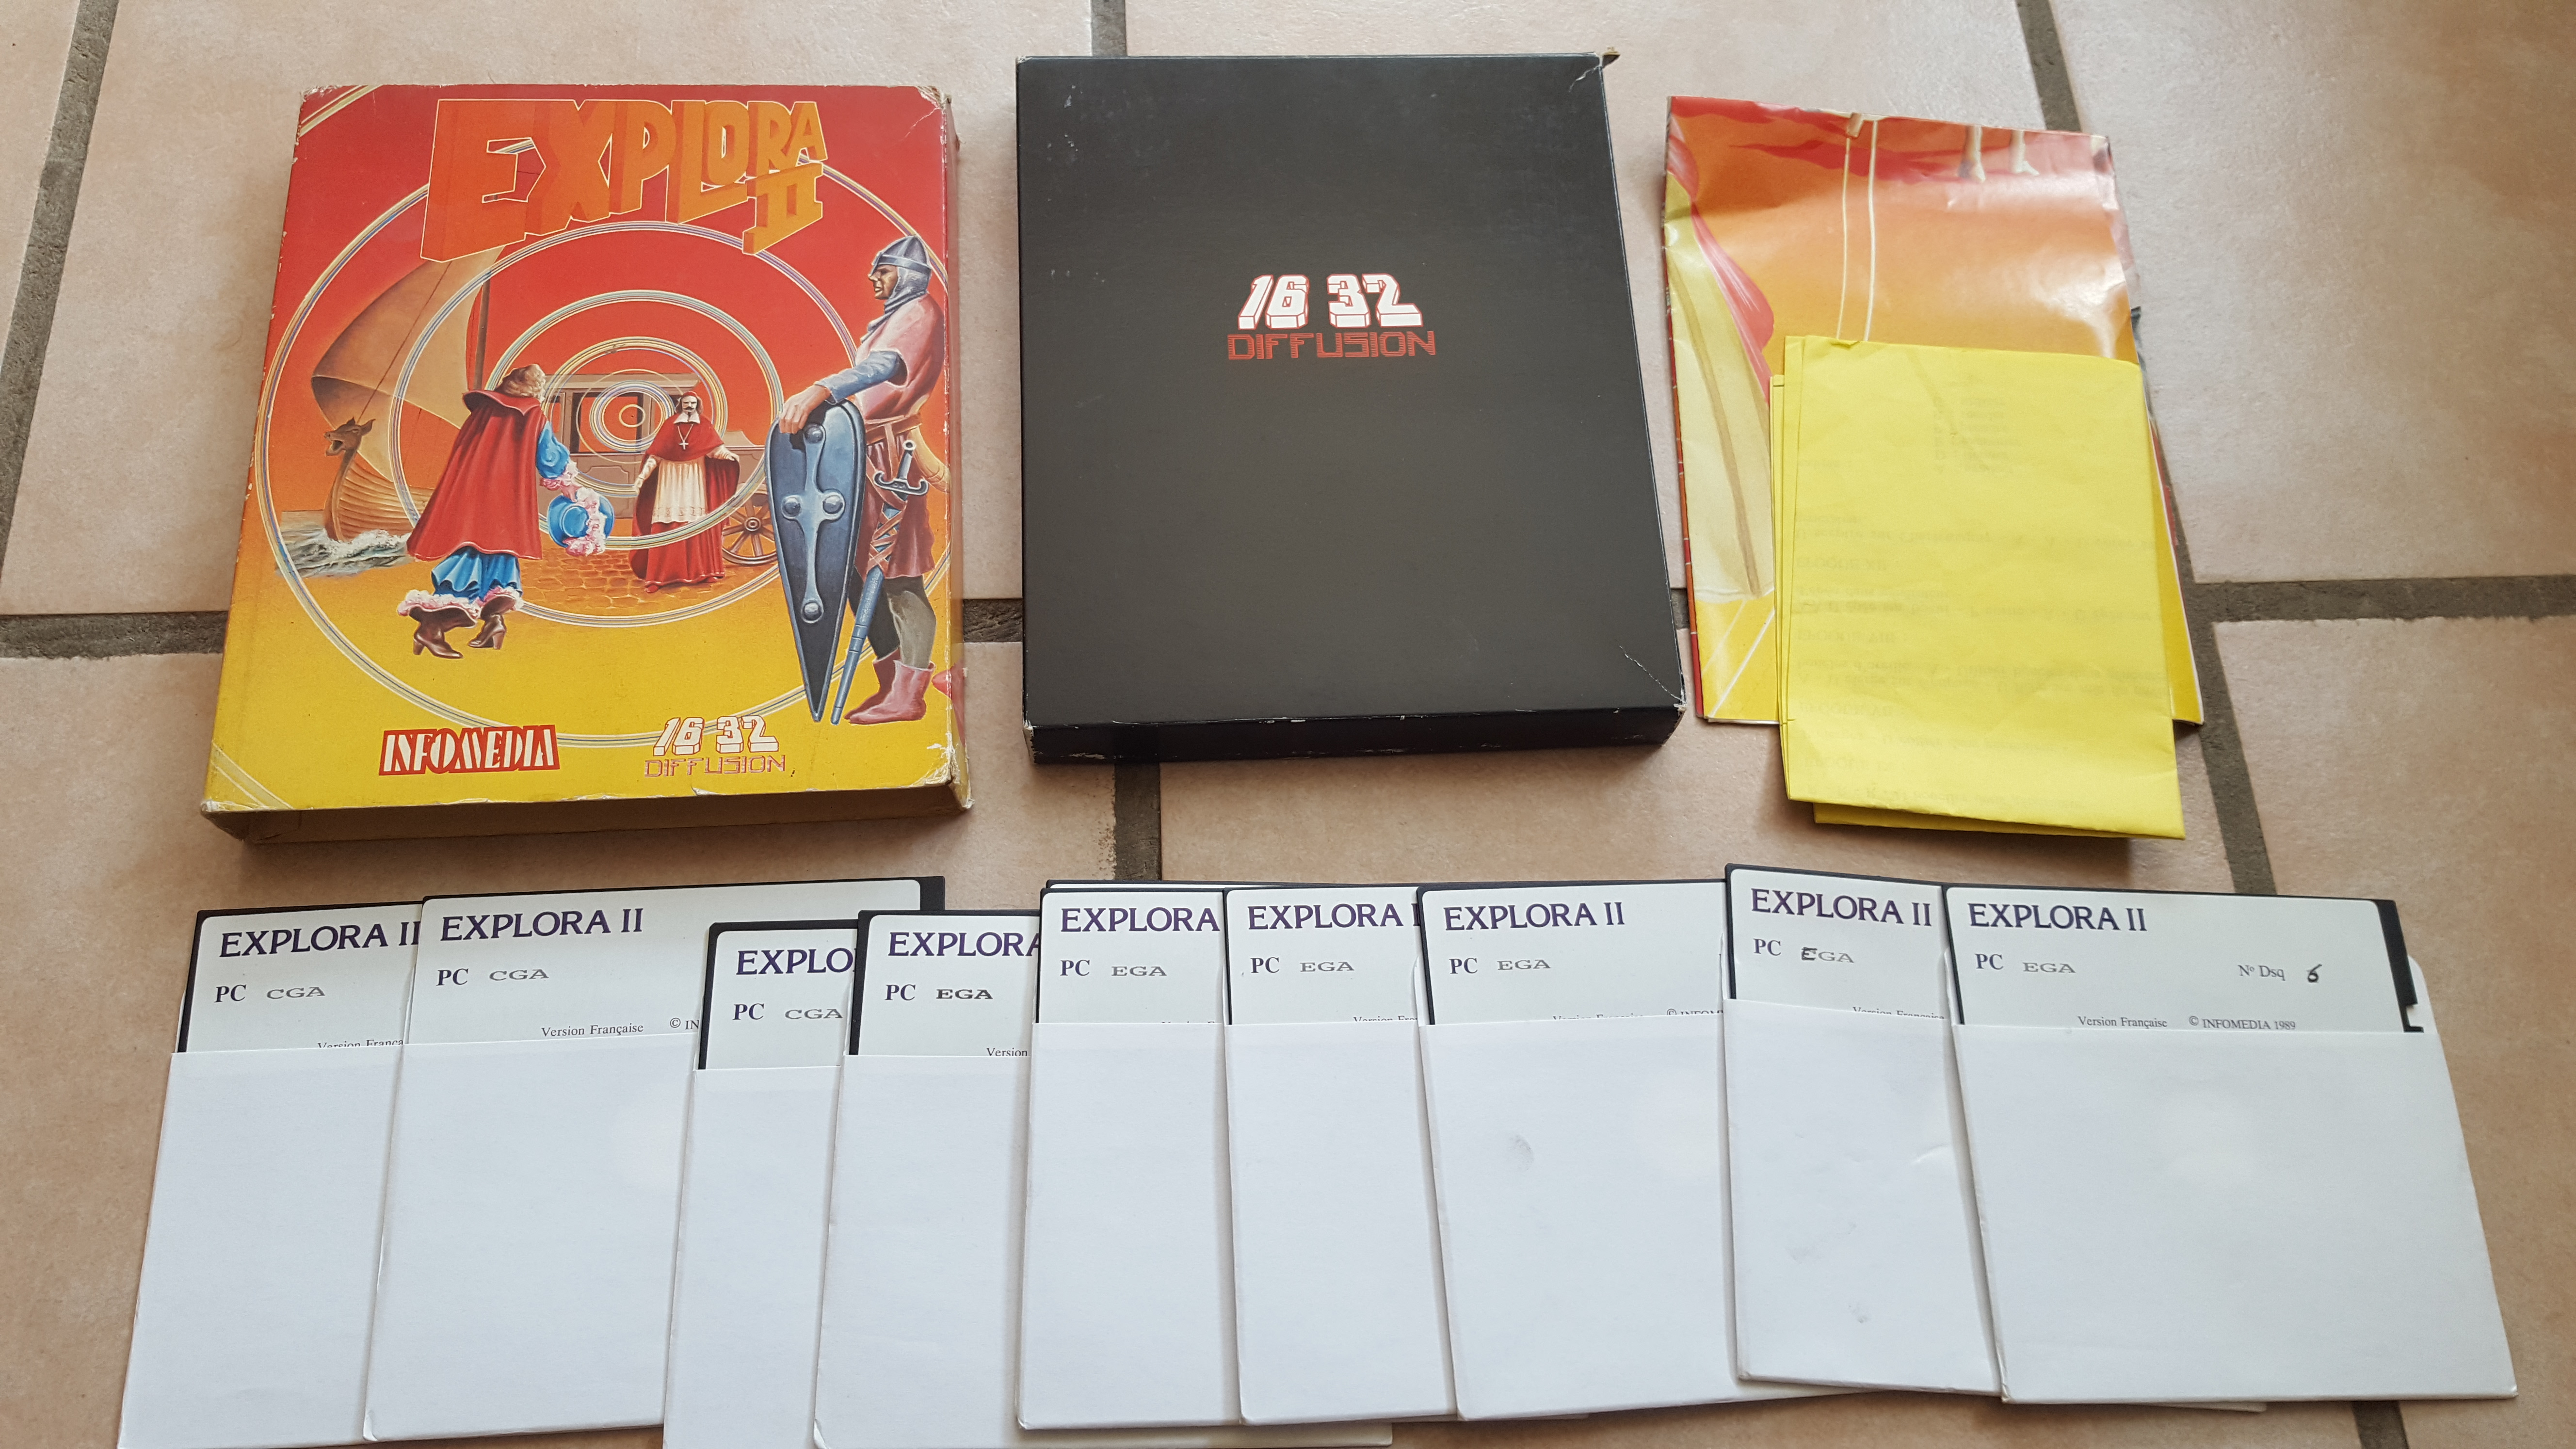 Vente ordinateurs et jeux Atari, Amiga, Amstrad et PC MAJ 20/01 - Page 6 5gQm7